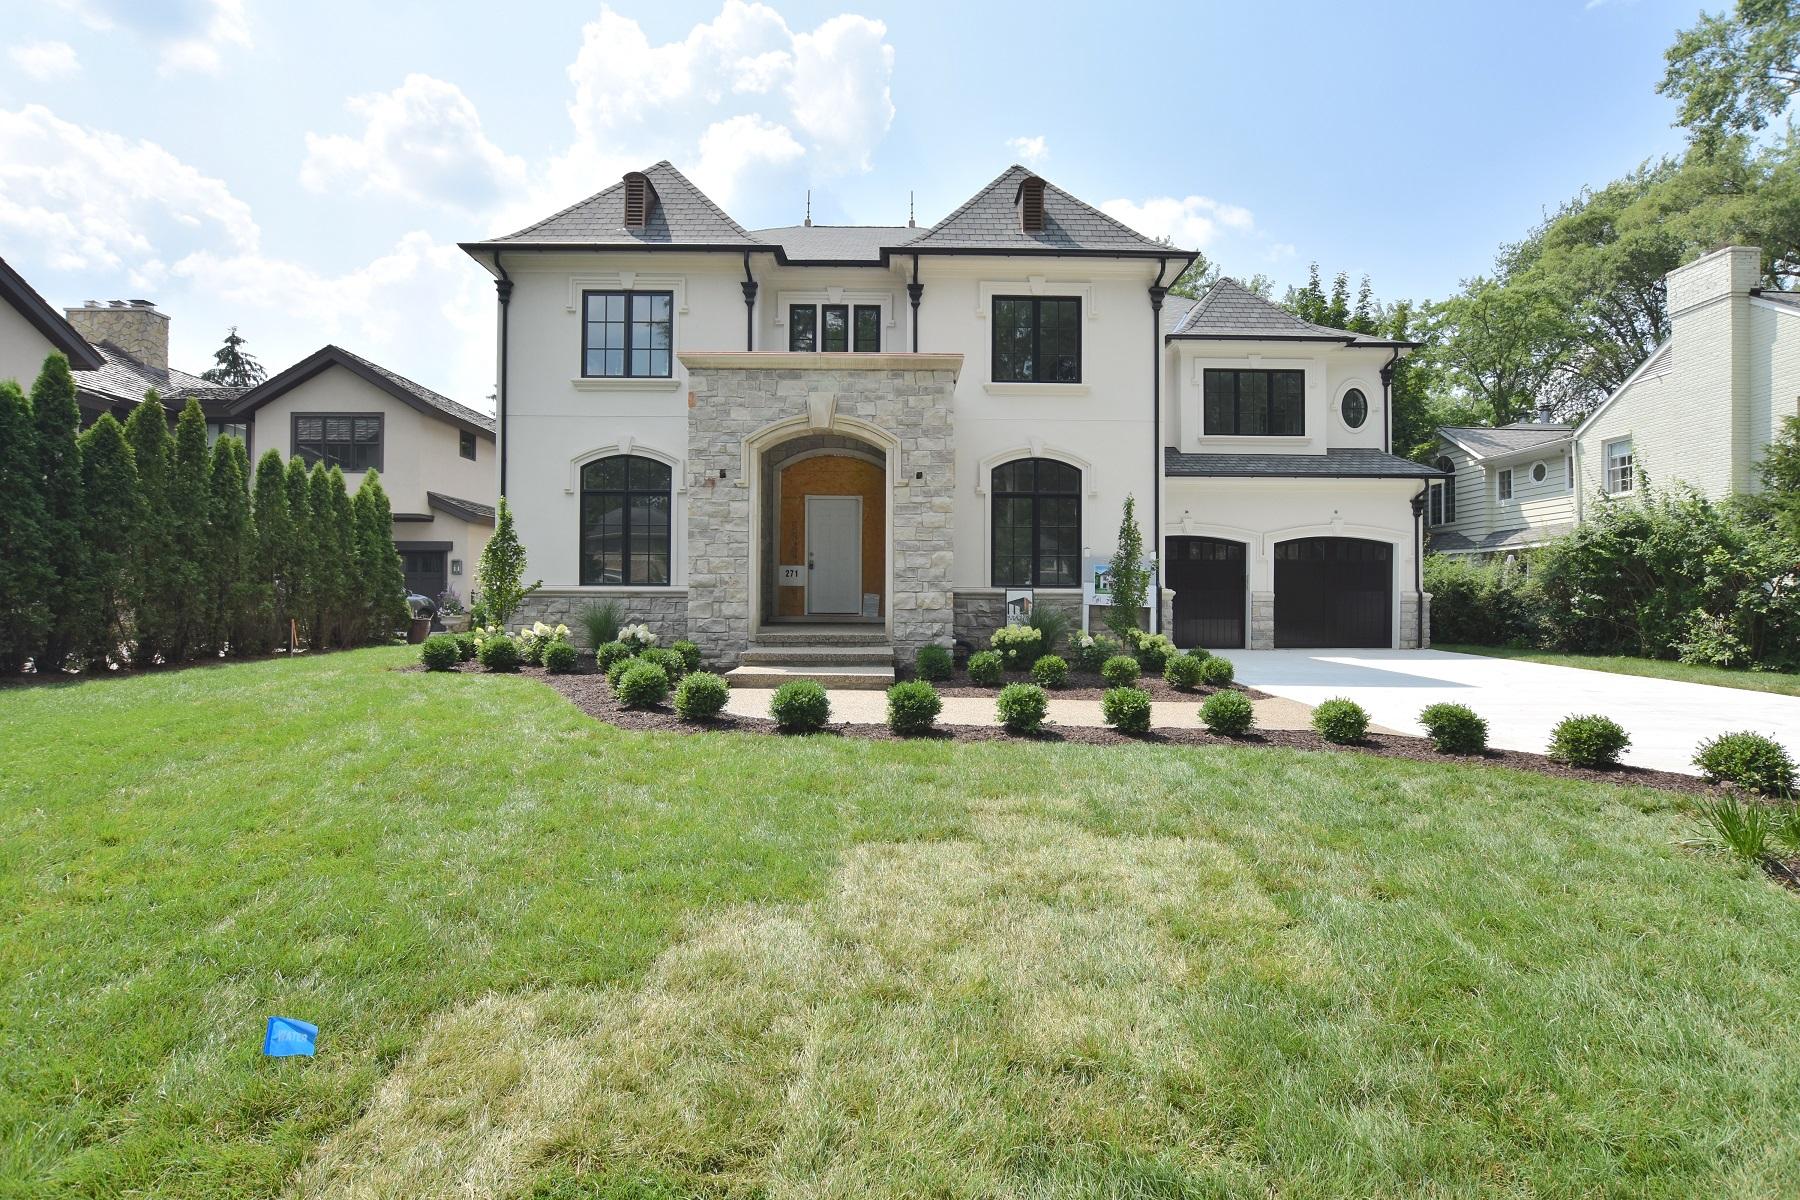 Single Family Homes for Active at Birmingham 271 Fairfax Street Birmingham, Michigan 48009 United States